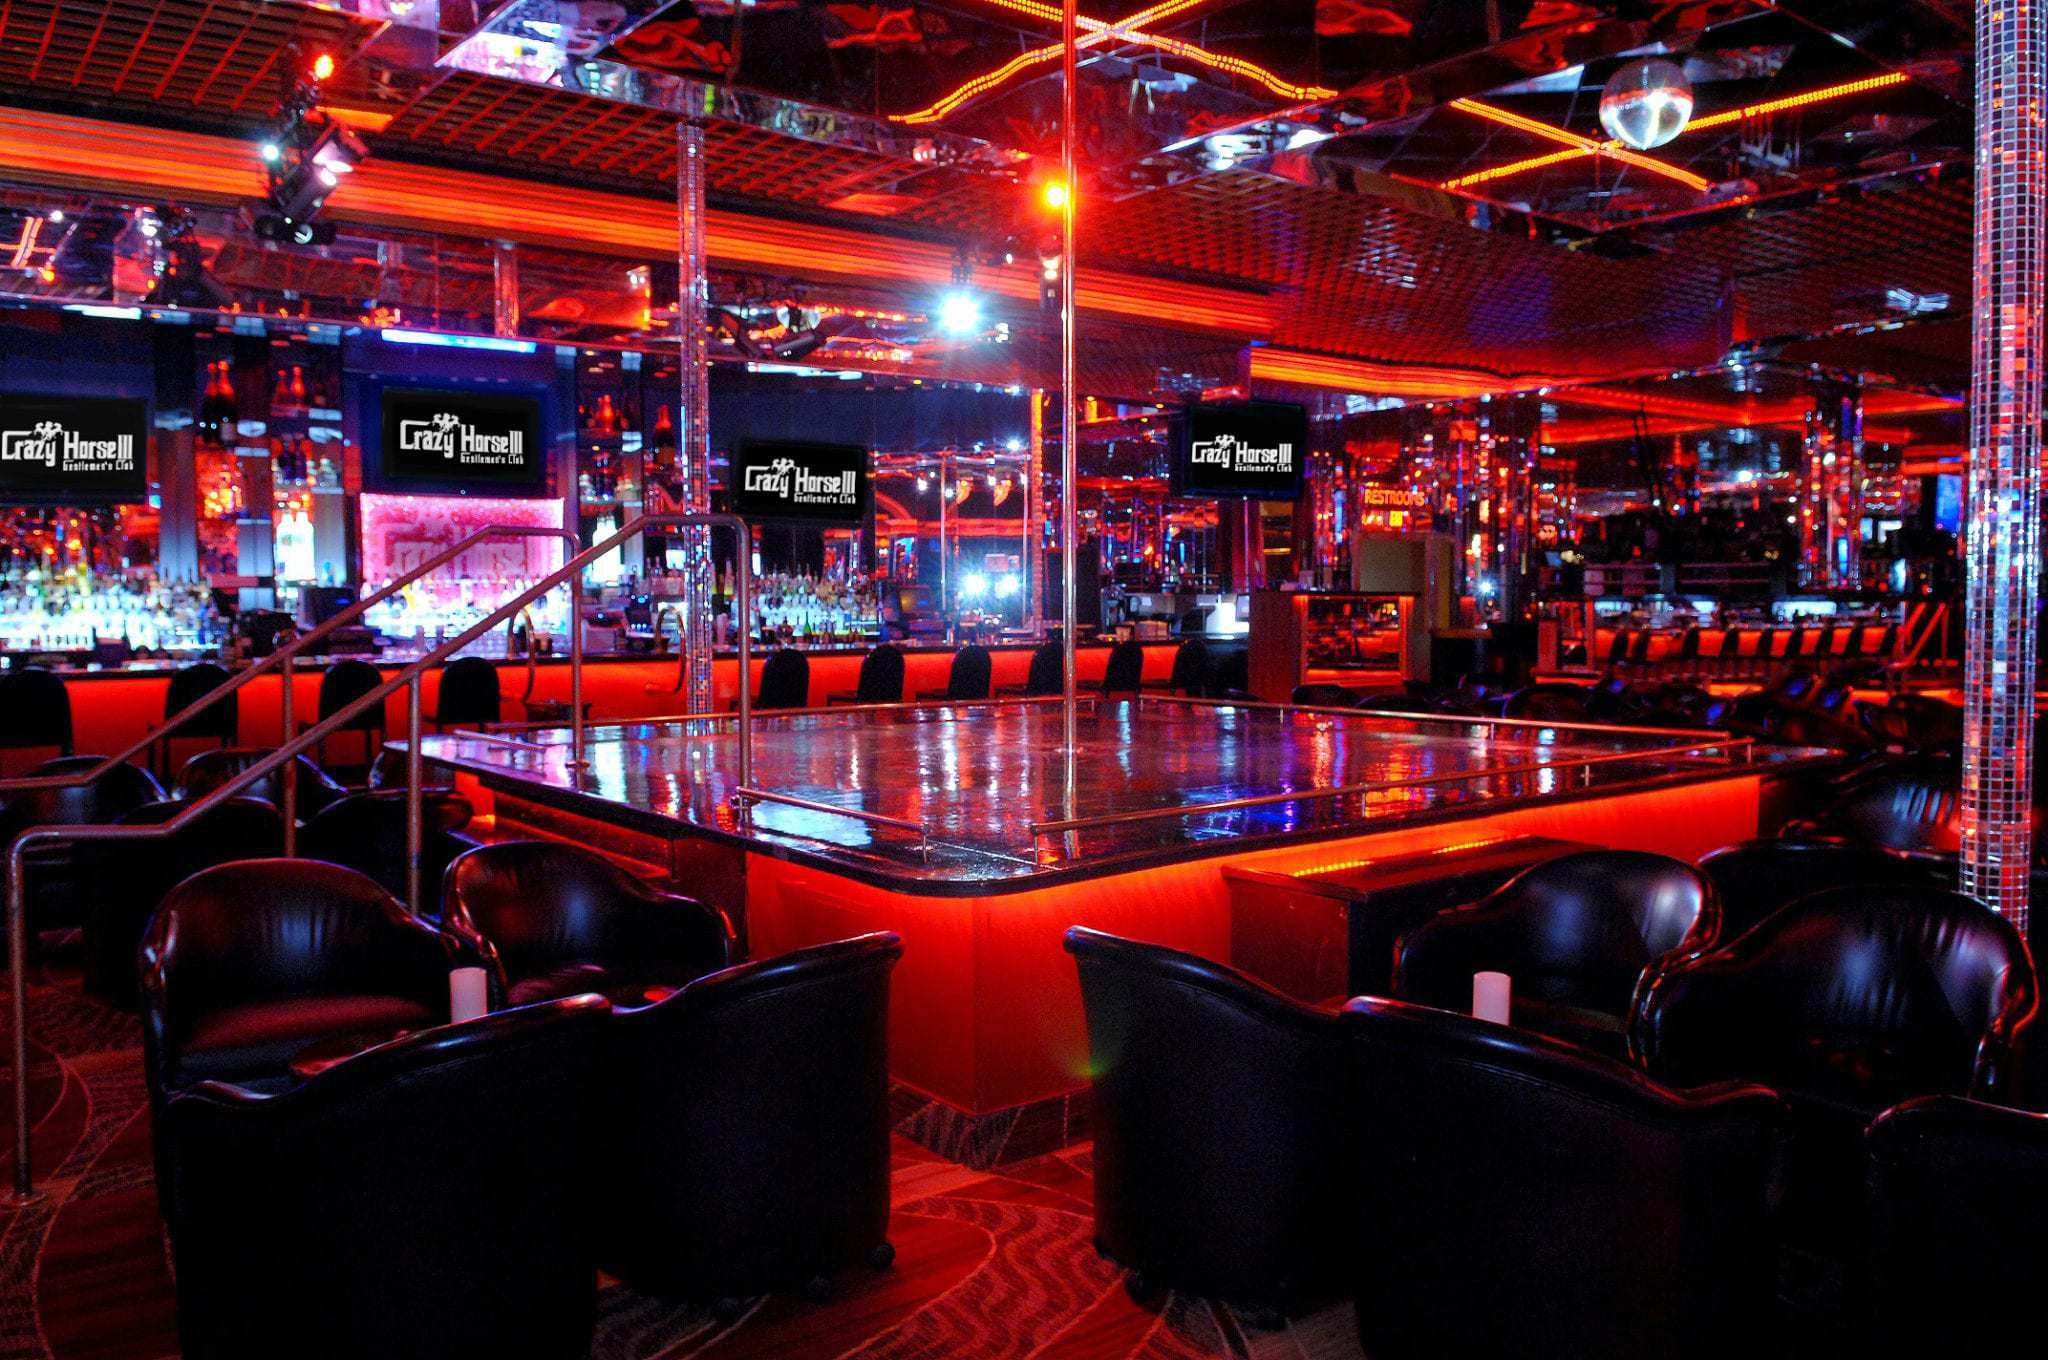 La bares strip club